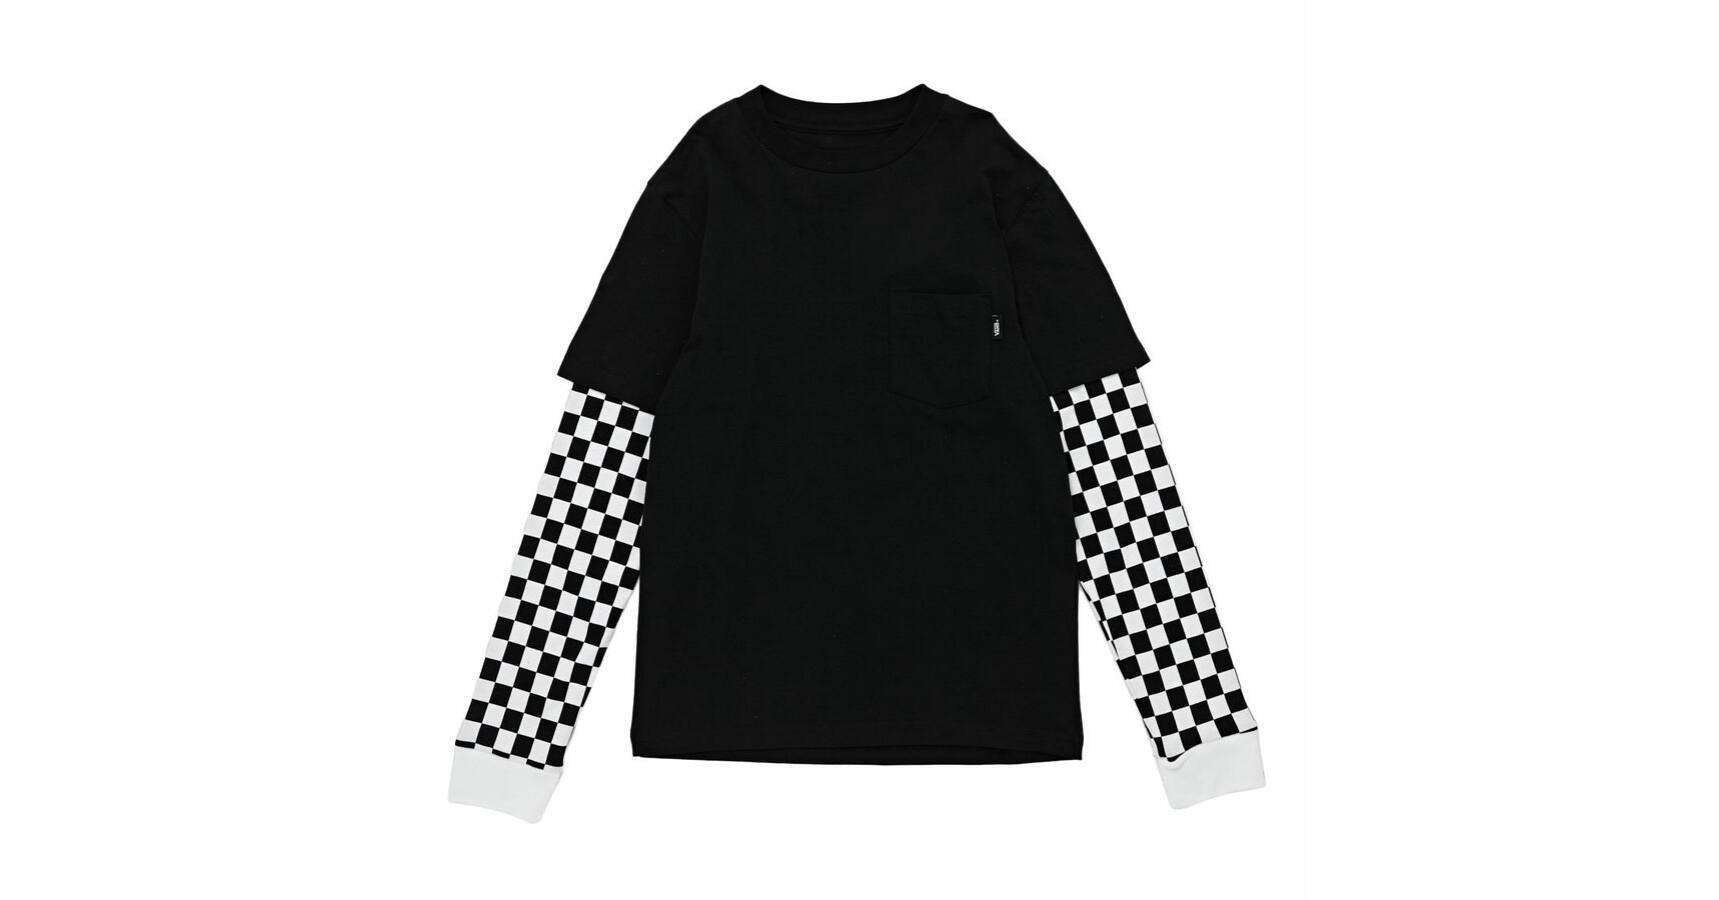 ac4796fc4ed455 Vans Checker Sleeve Two Fer hosszúujjú póló Black Checker